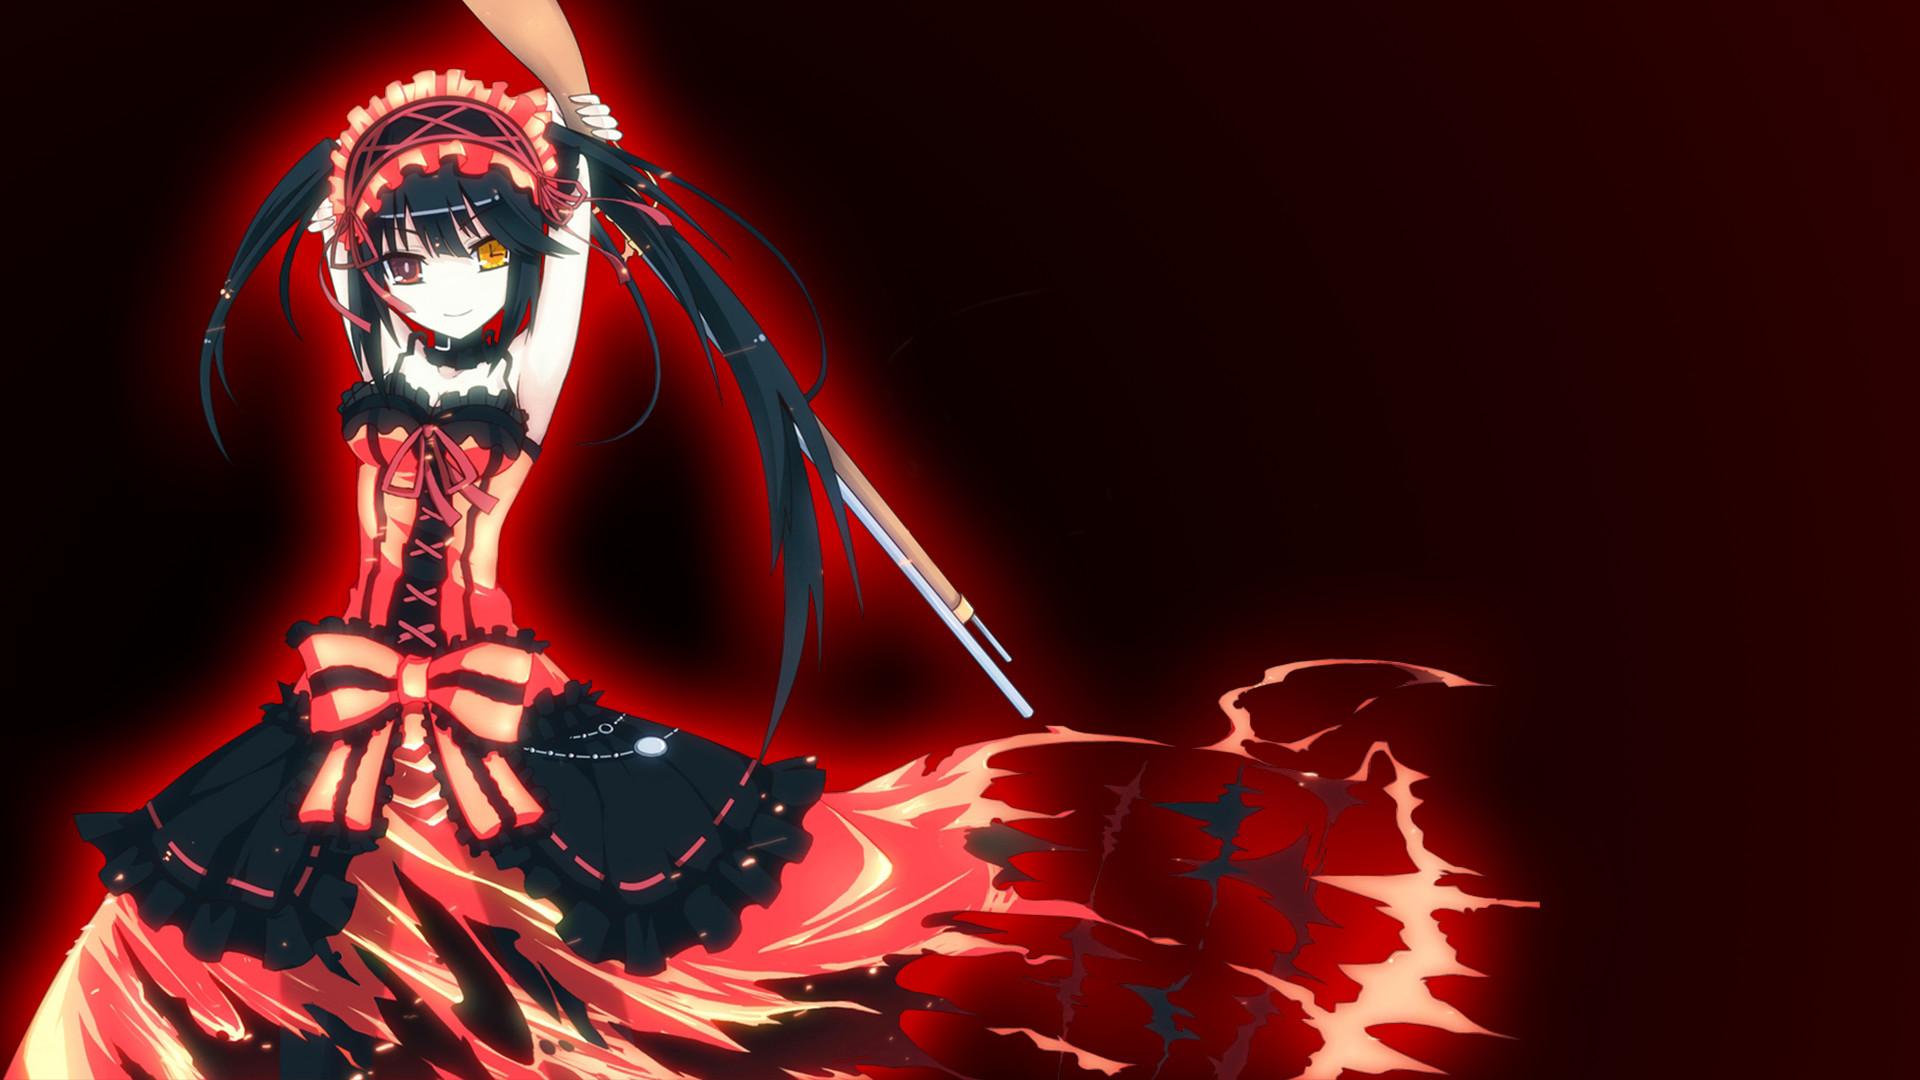 Anime – Date A Live Heterochromia Dress Black Hair Long Hair Gun Girl Anime  Kurumi Tokisaki